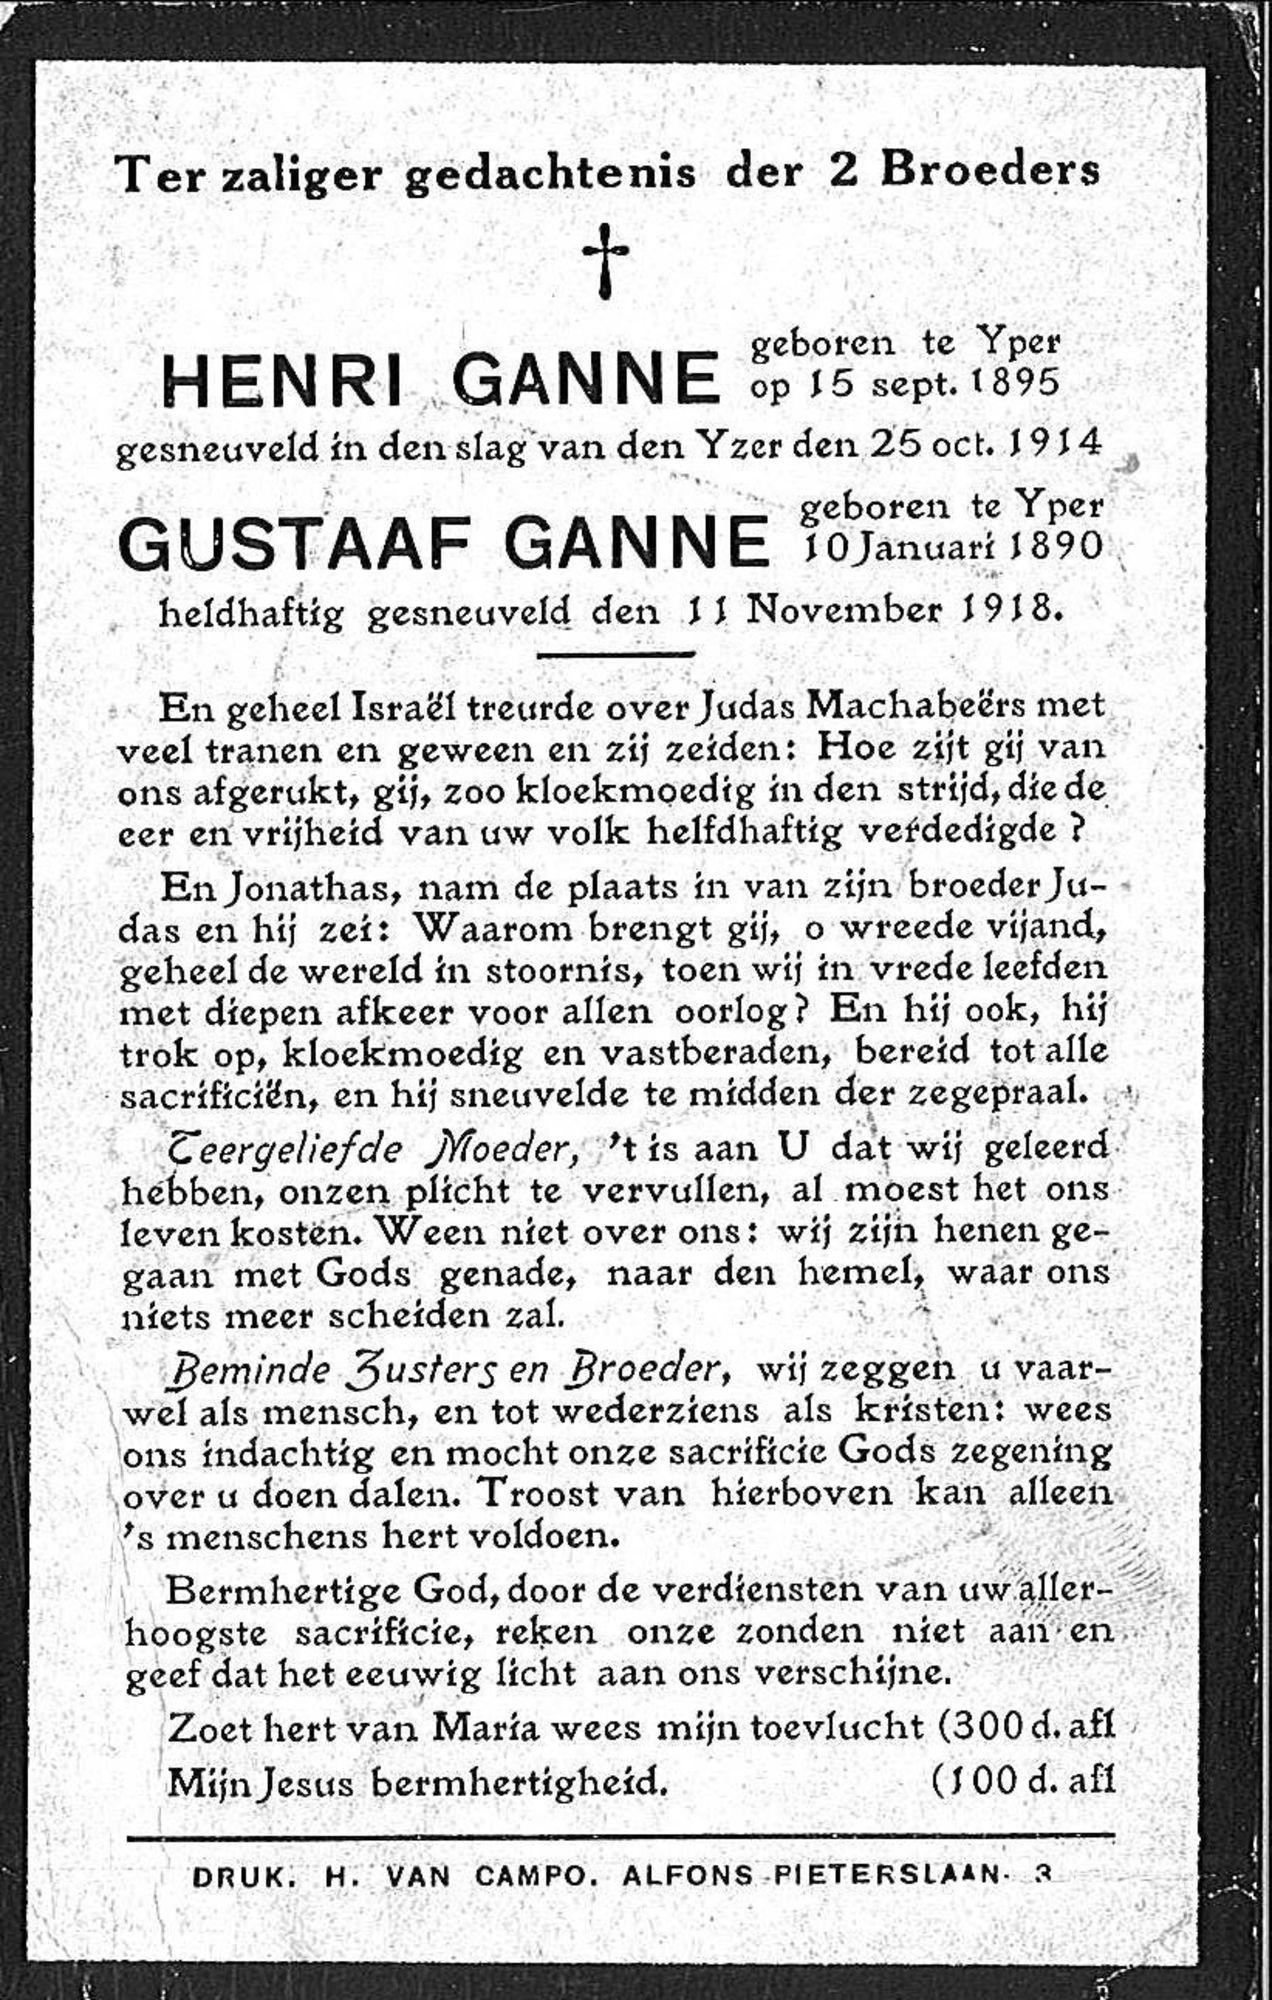 Henri Ganne